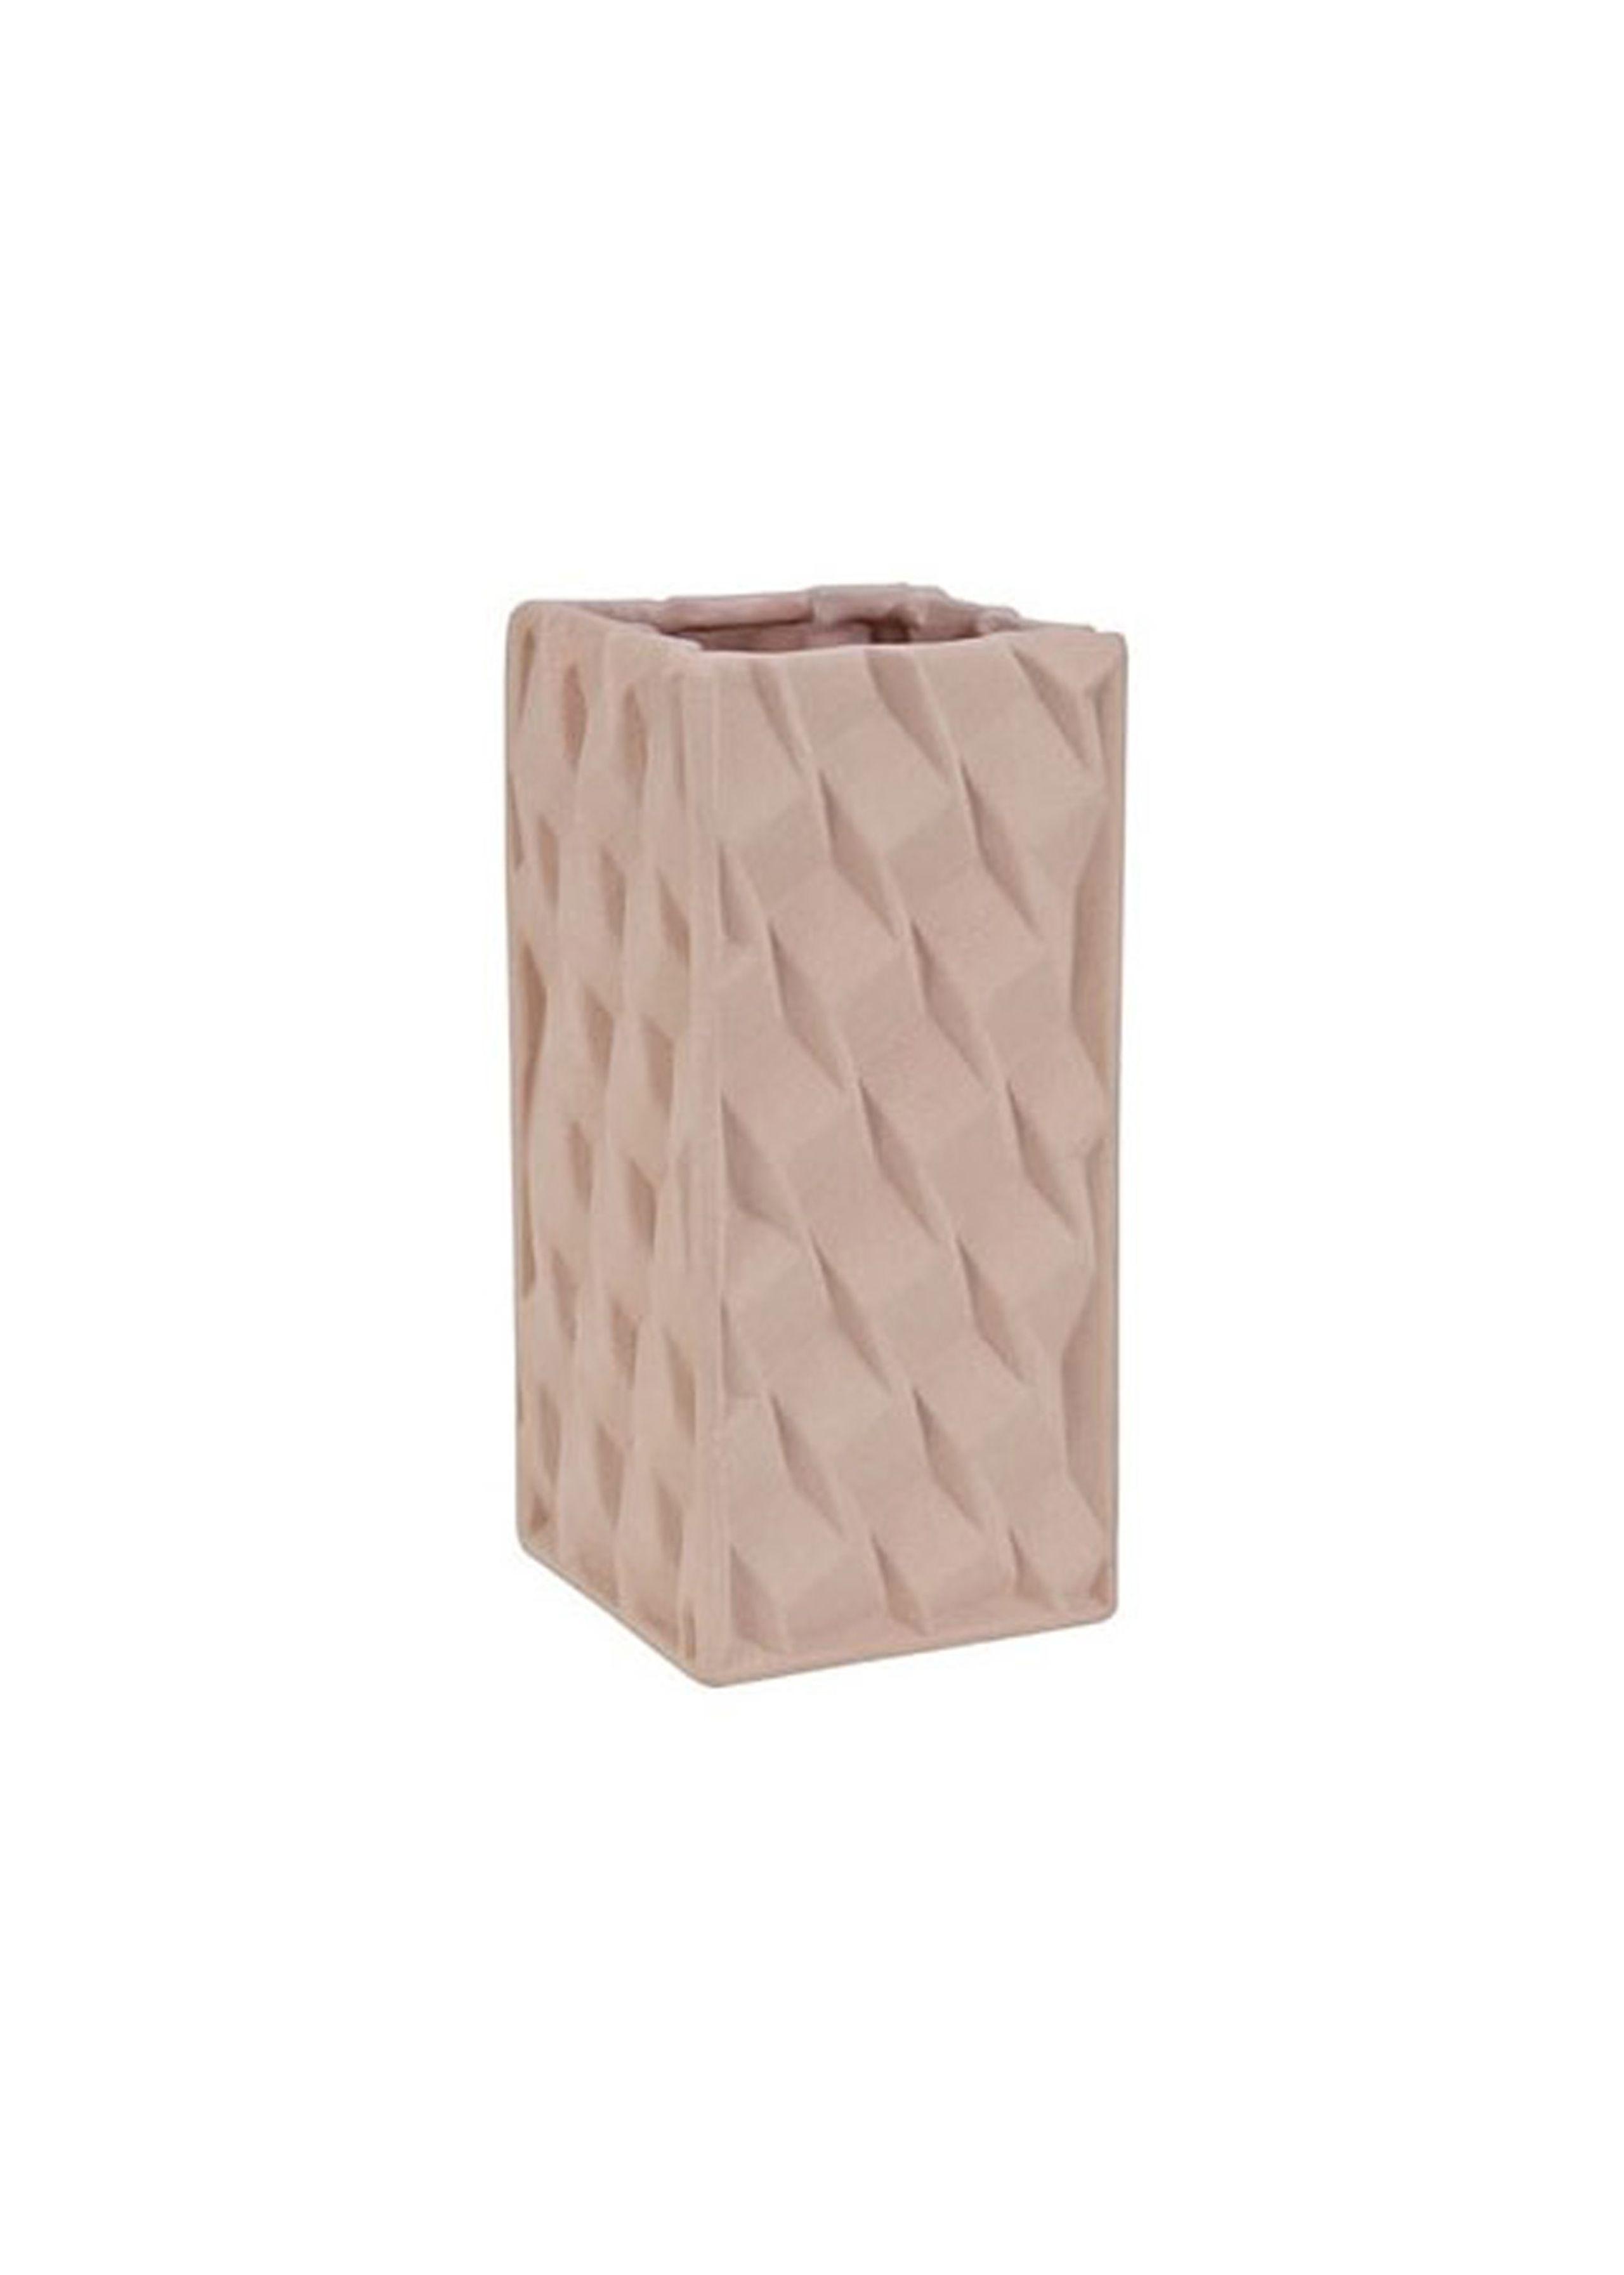 Grid vase - small